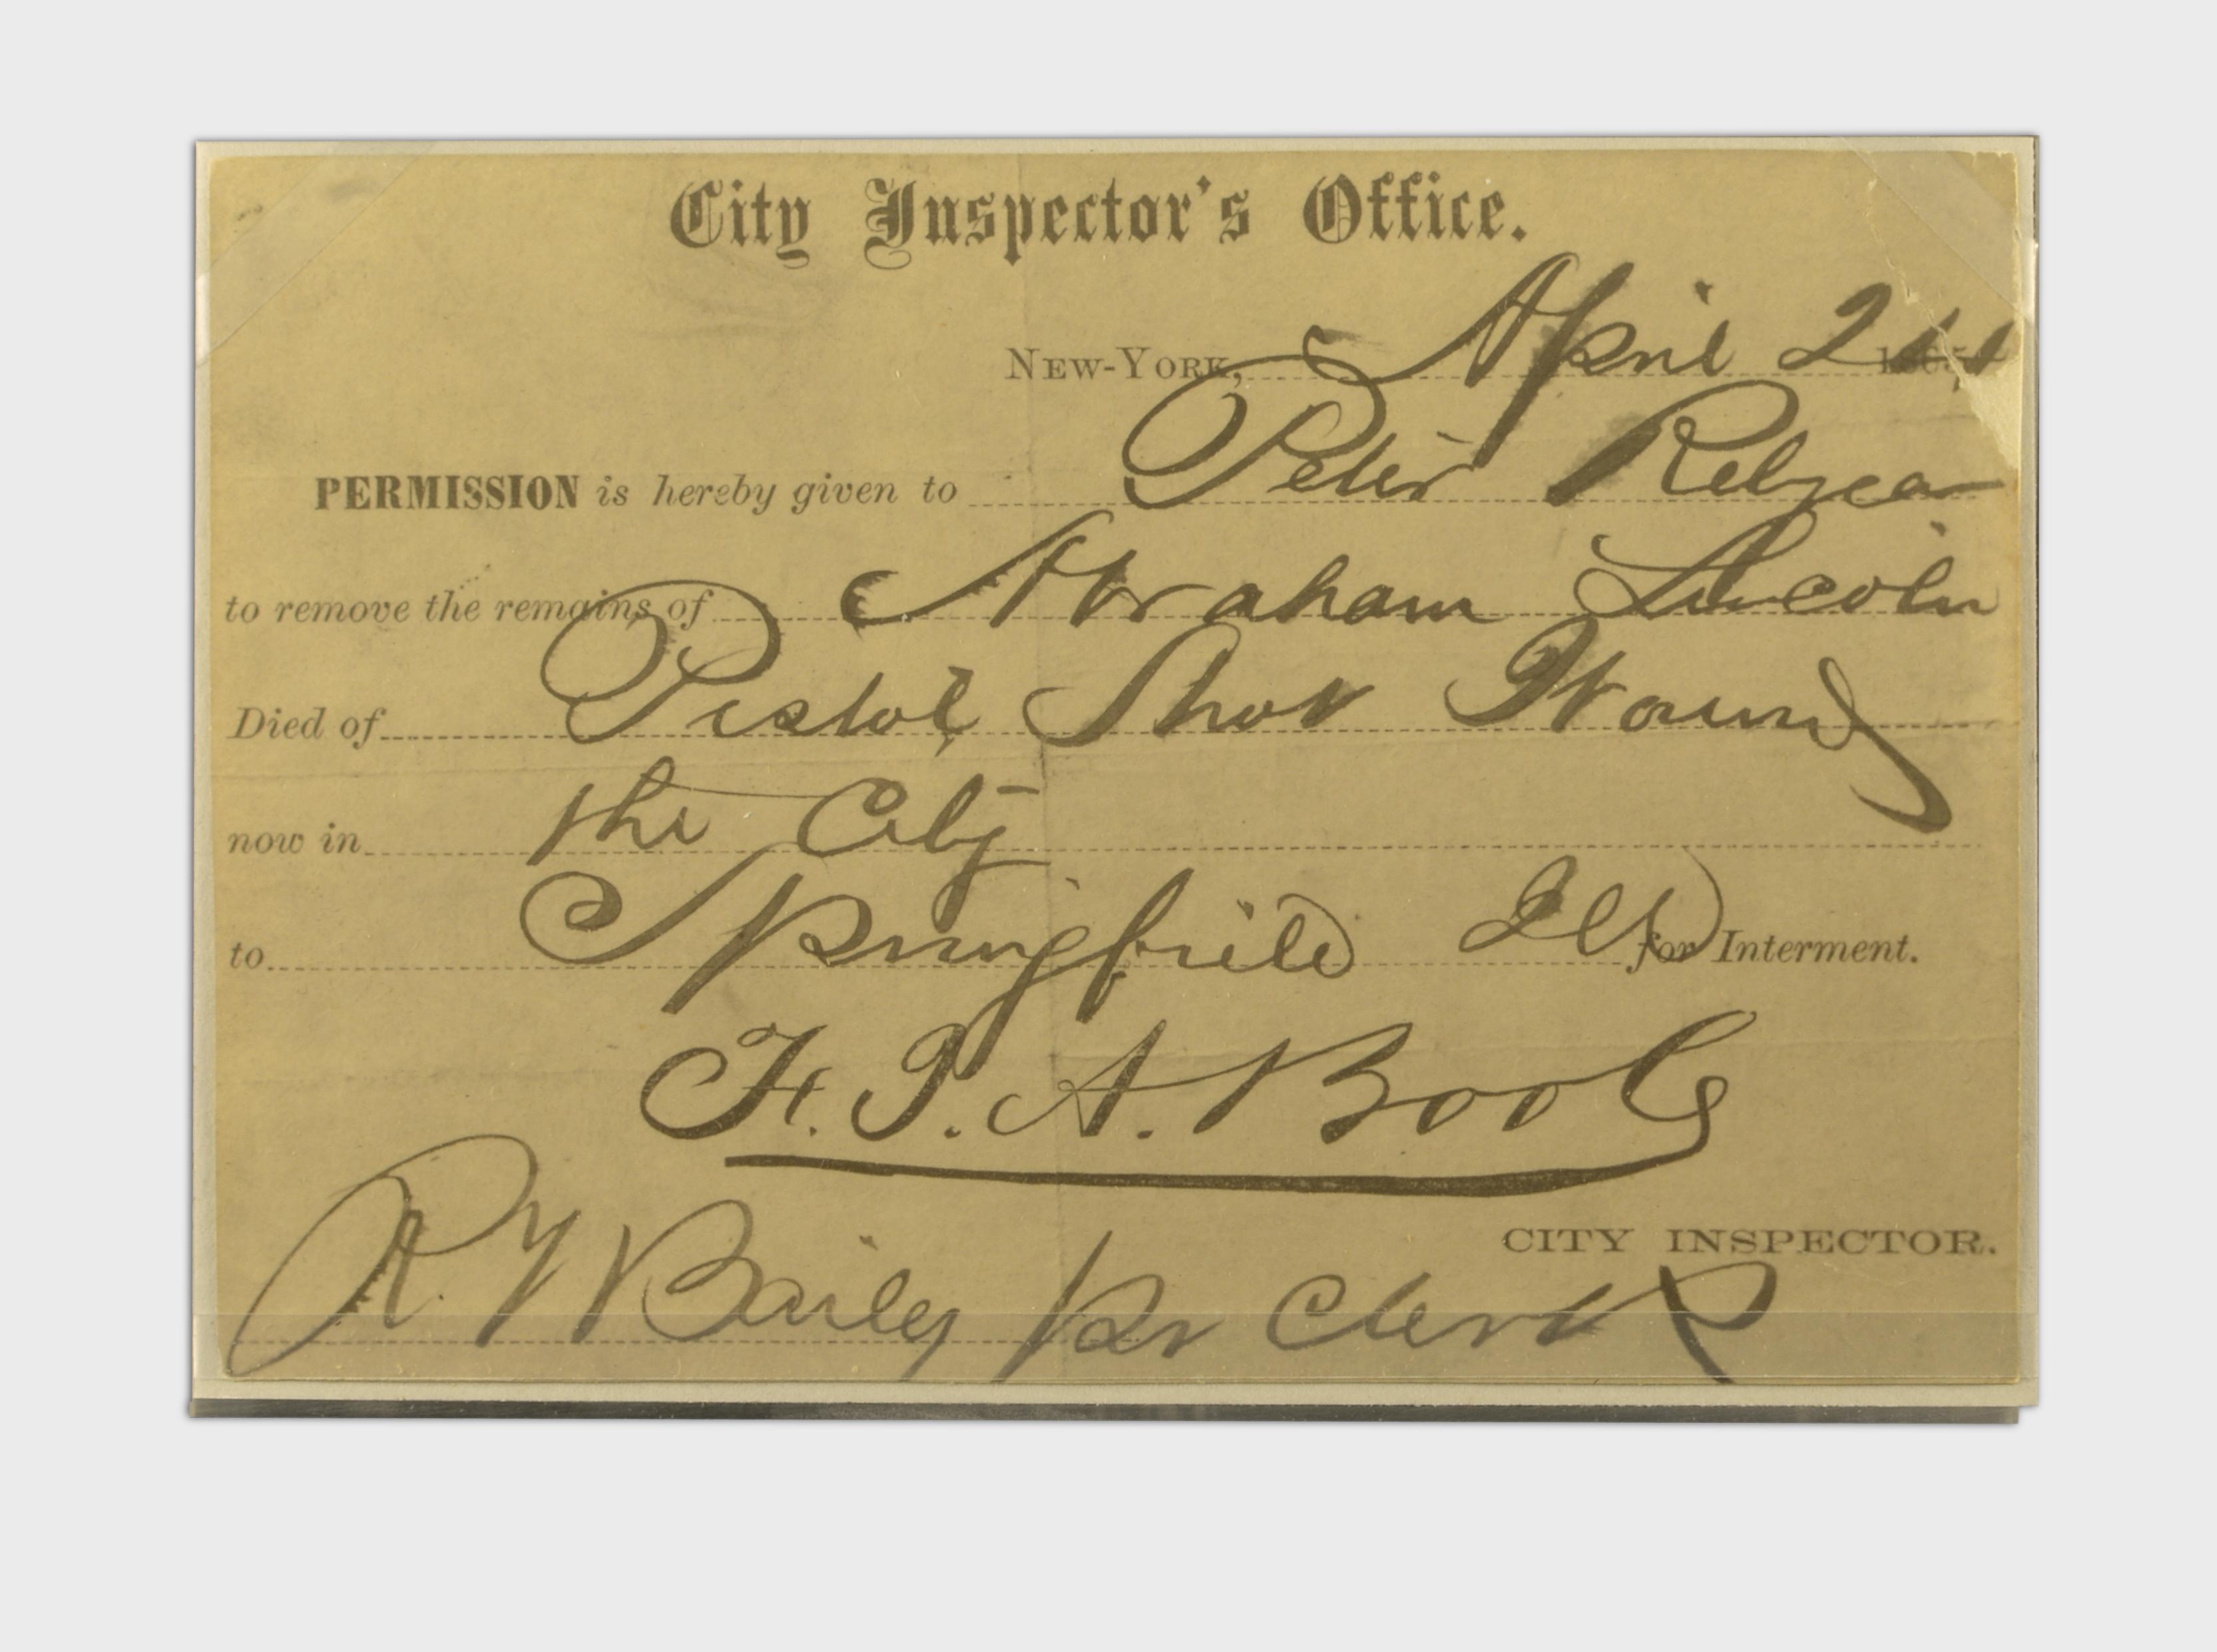 City Inspector's Office Certificate